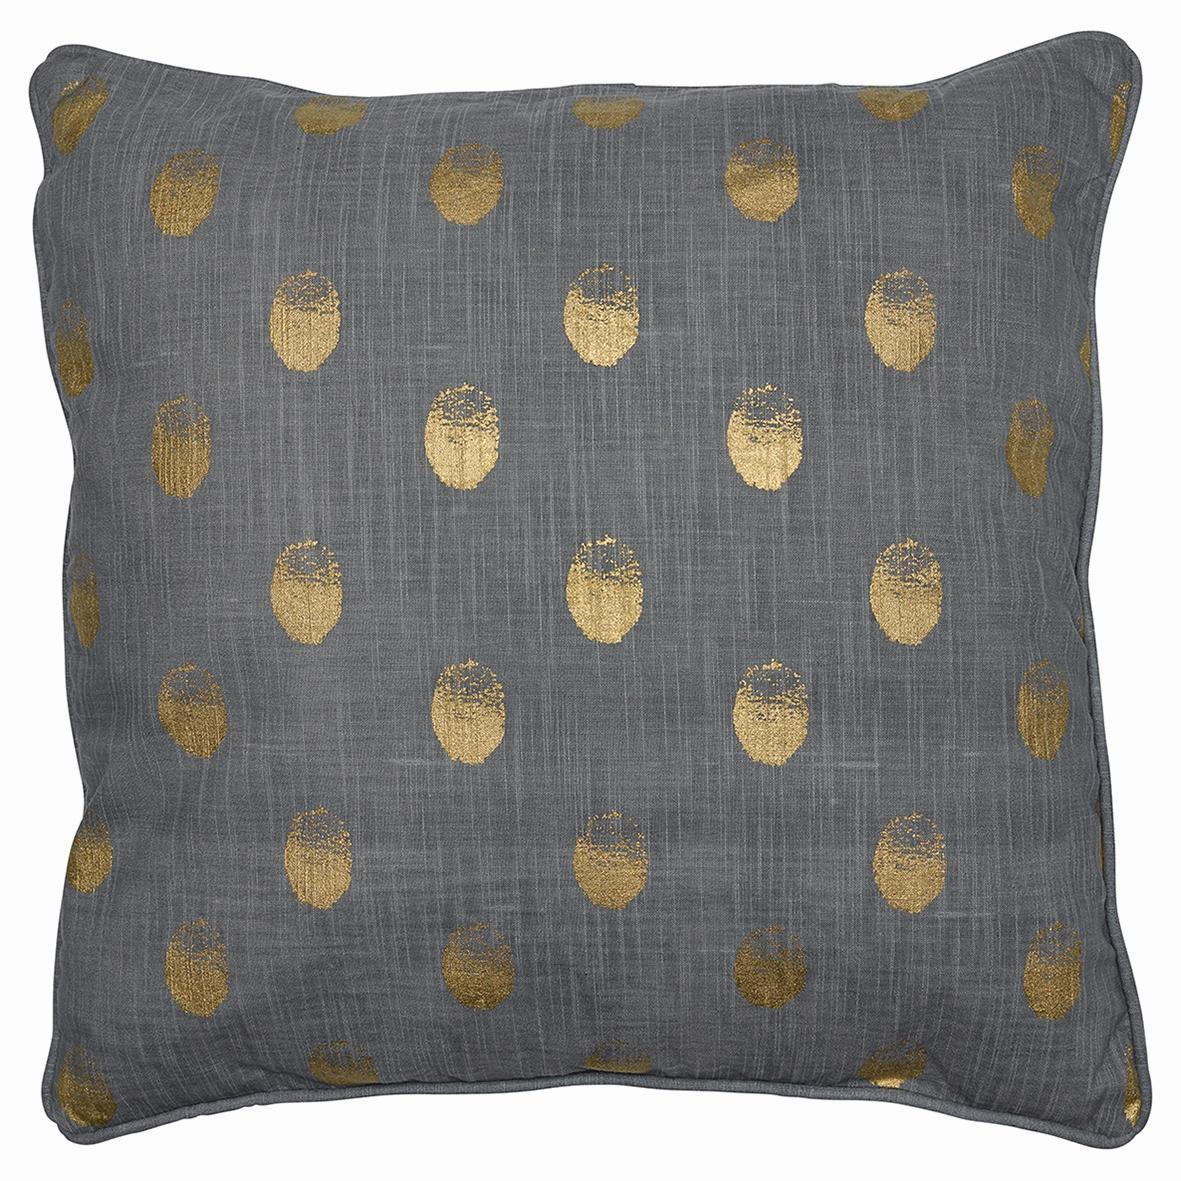 GREEN GATE Povlak na polštář Paula gold 50x50, šedá barva, zlatá barva, textil